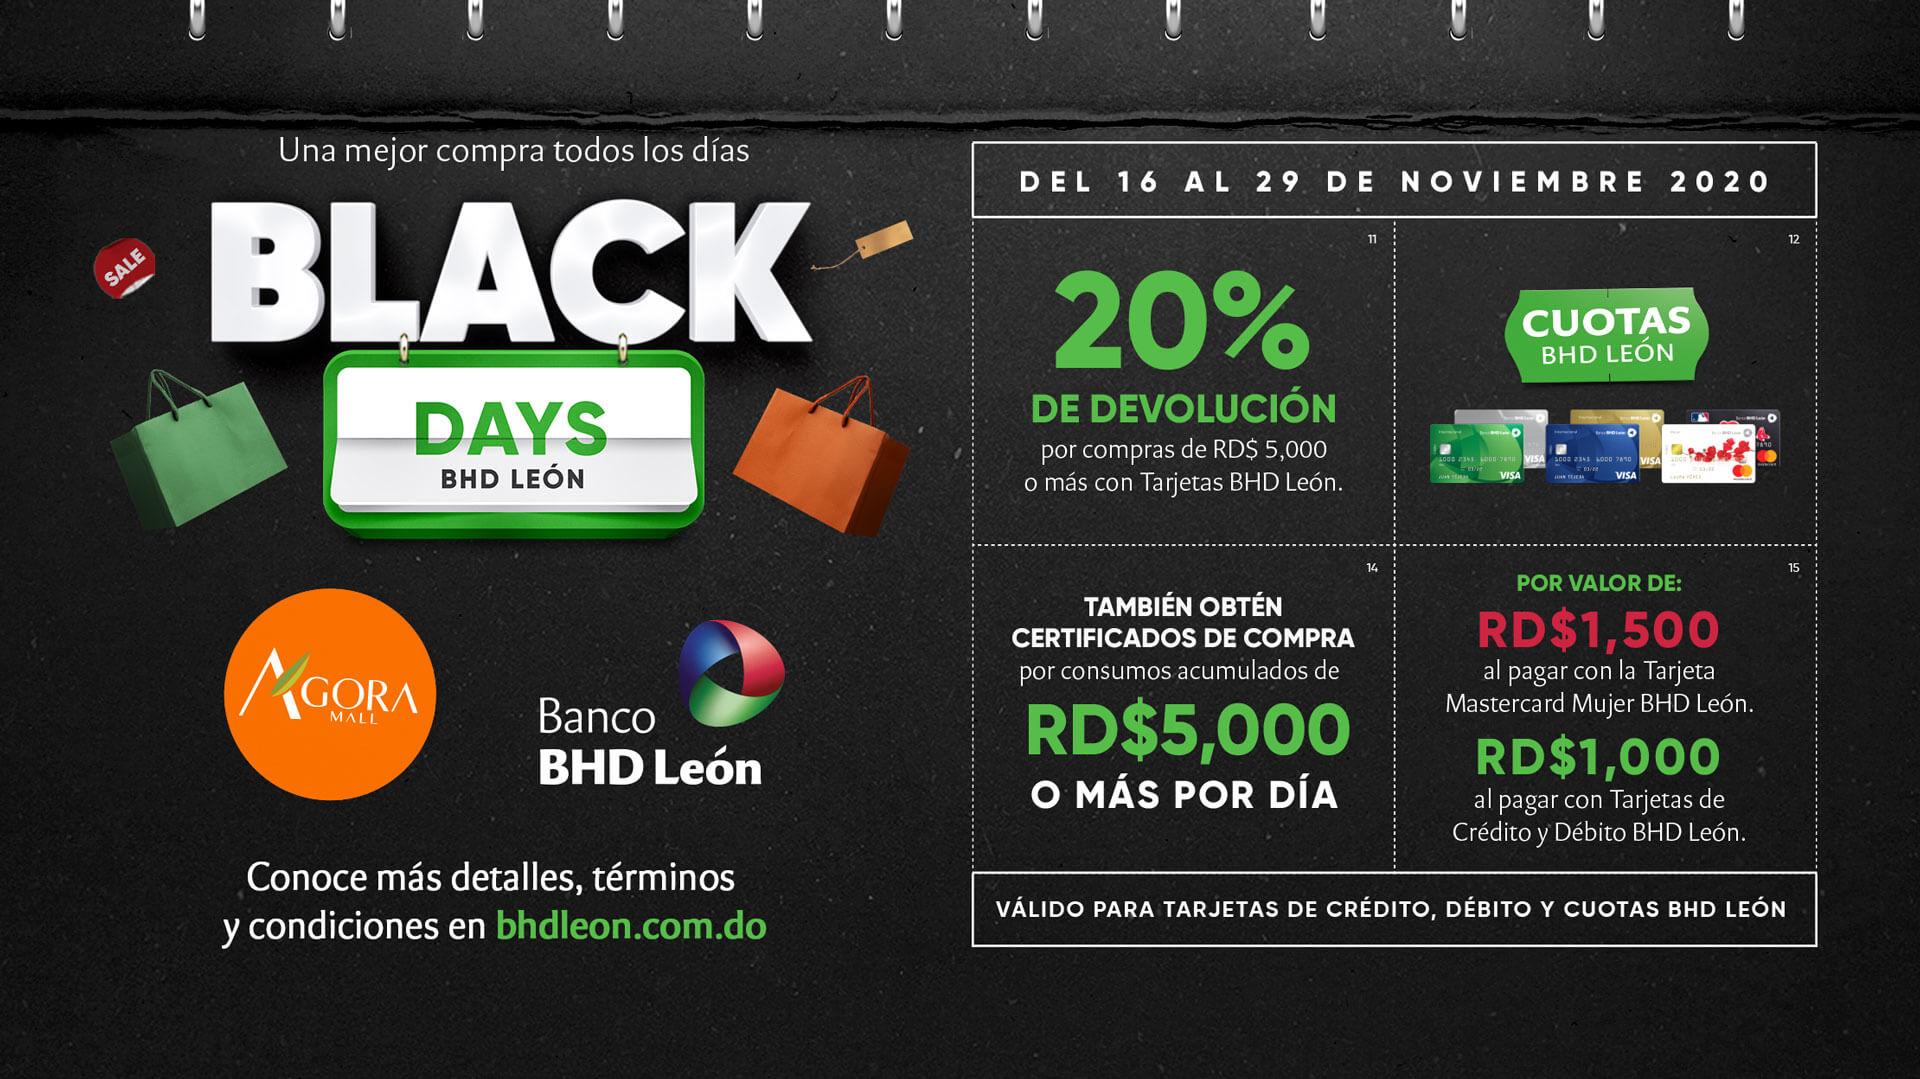 BHD - Black days